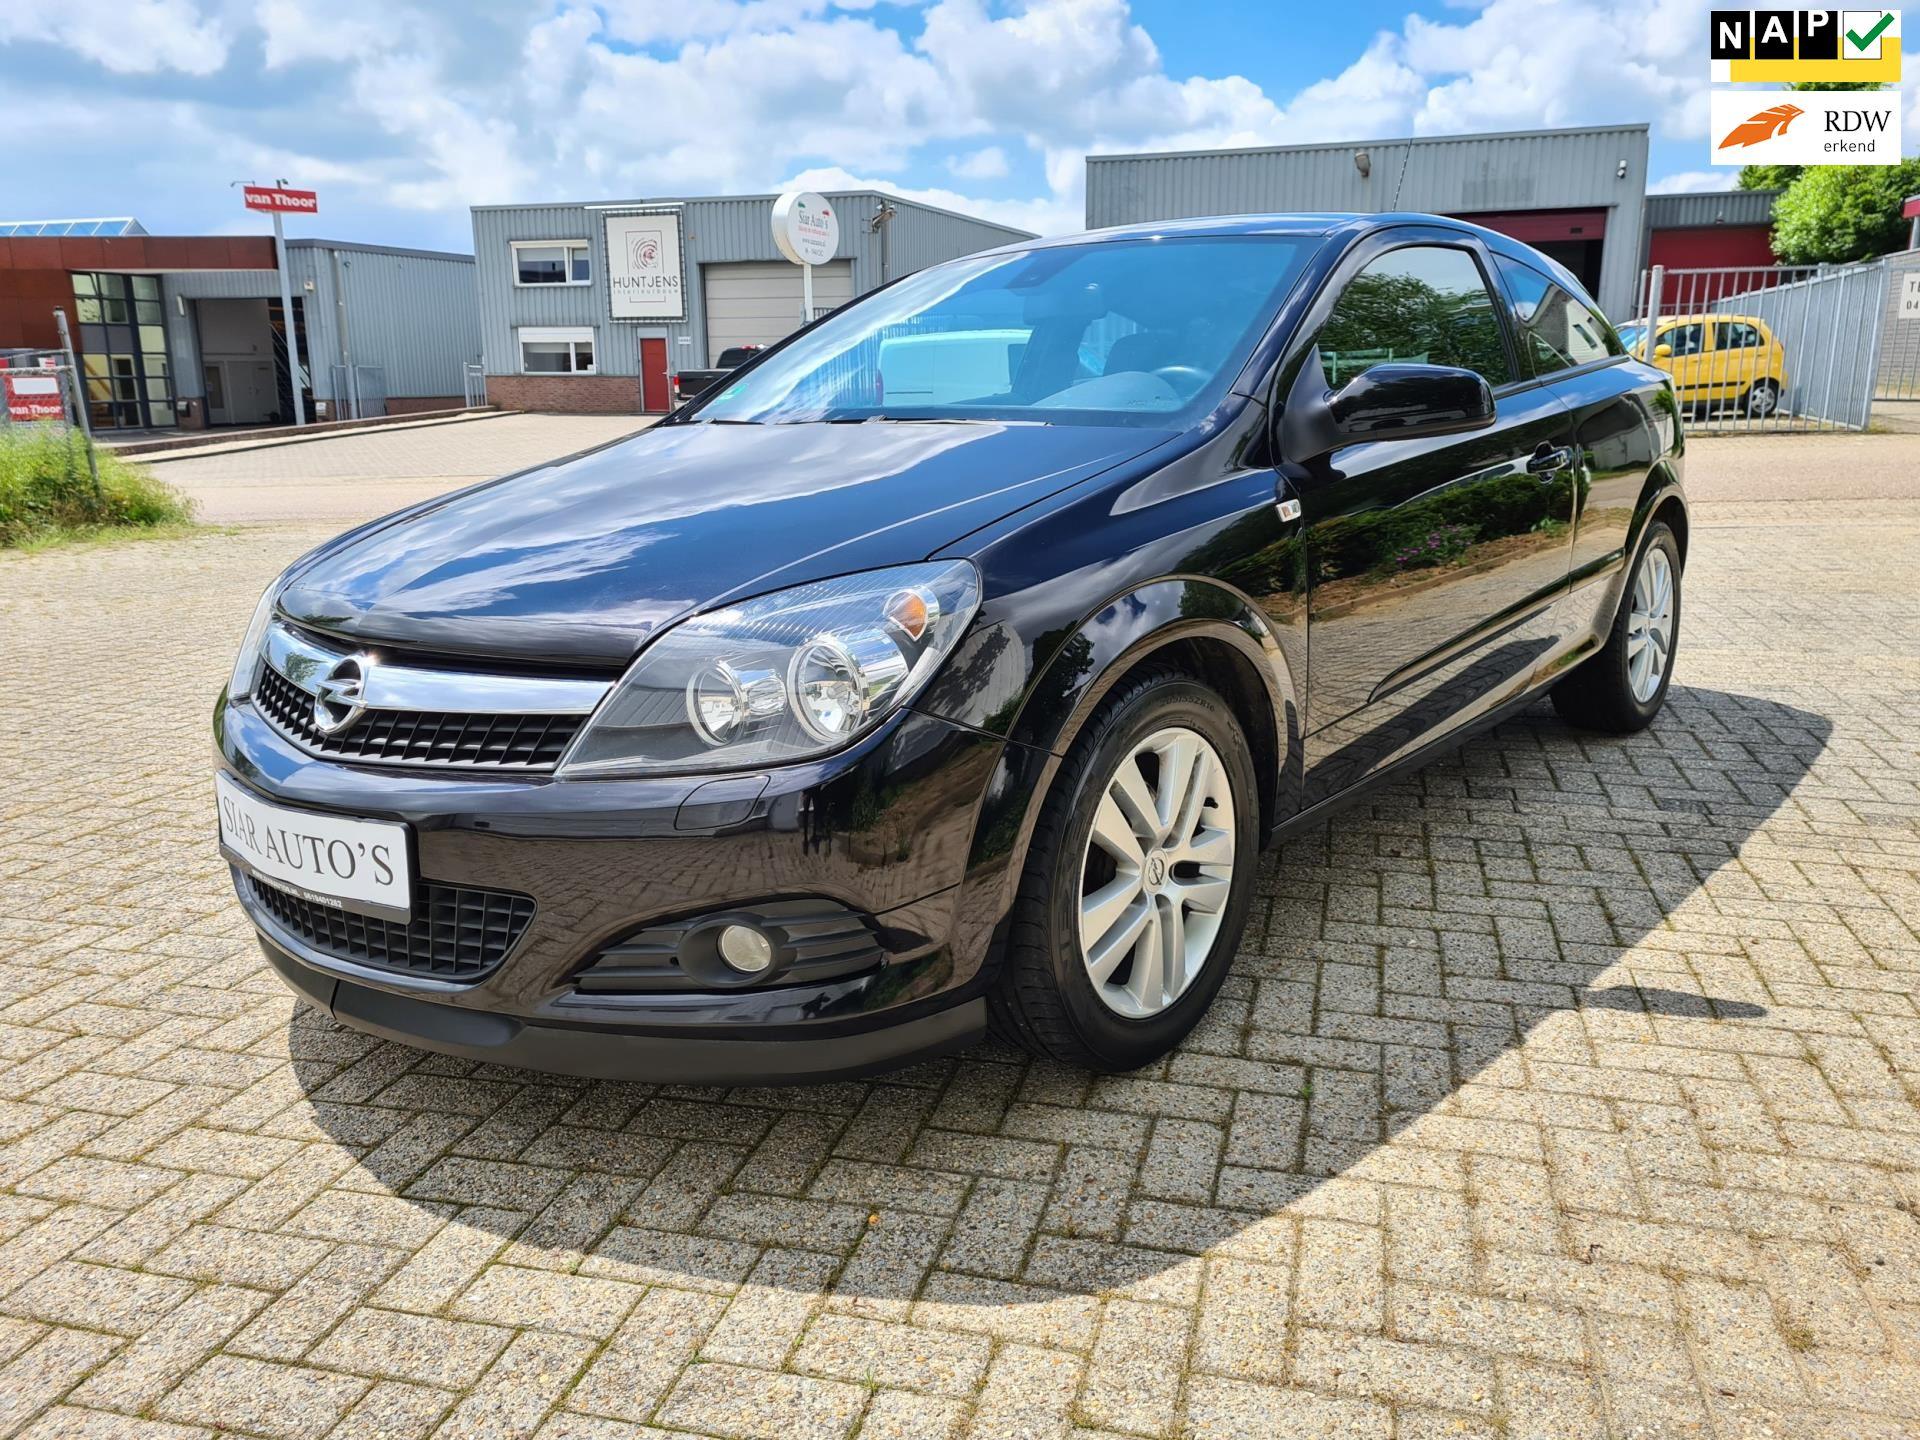 Opel Astra GTC occasion - Siar Auto's